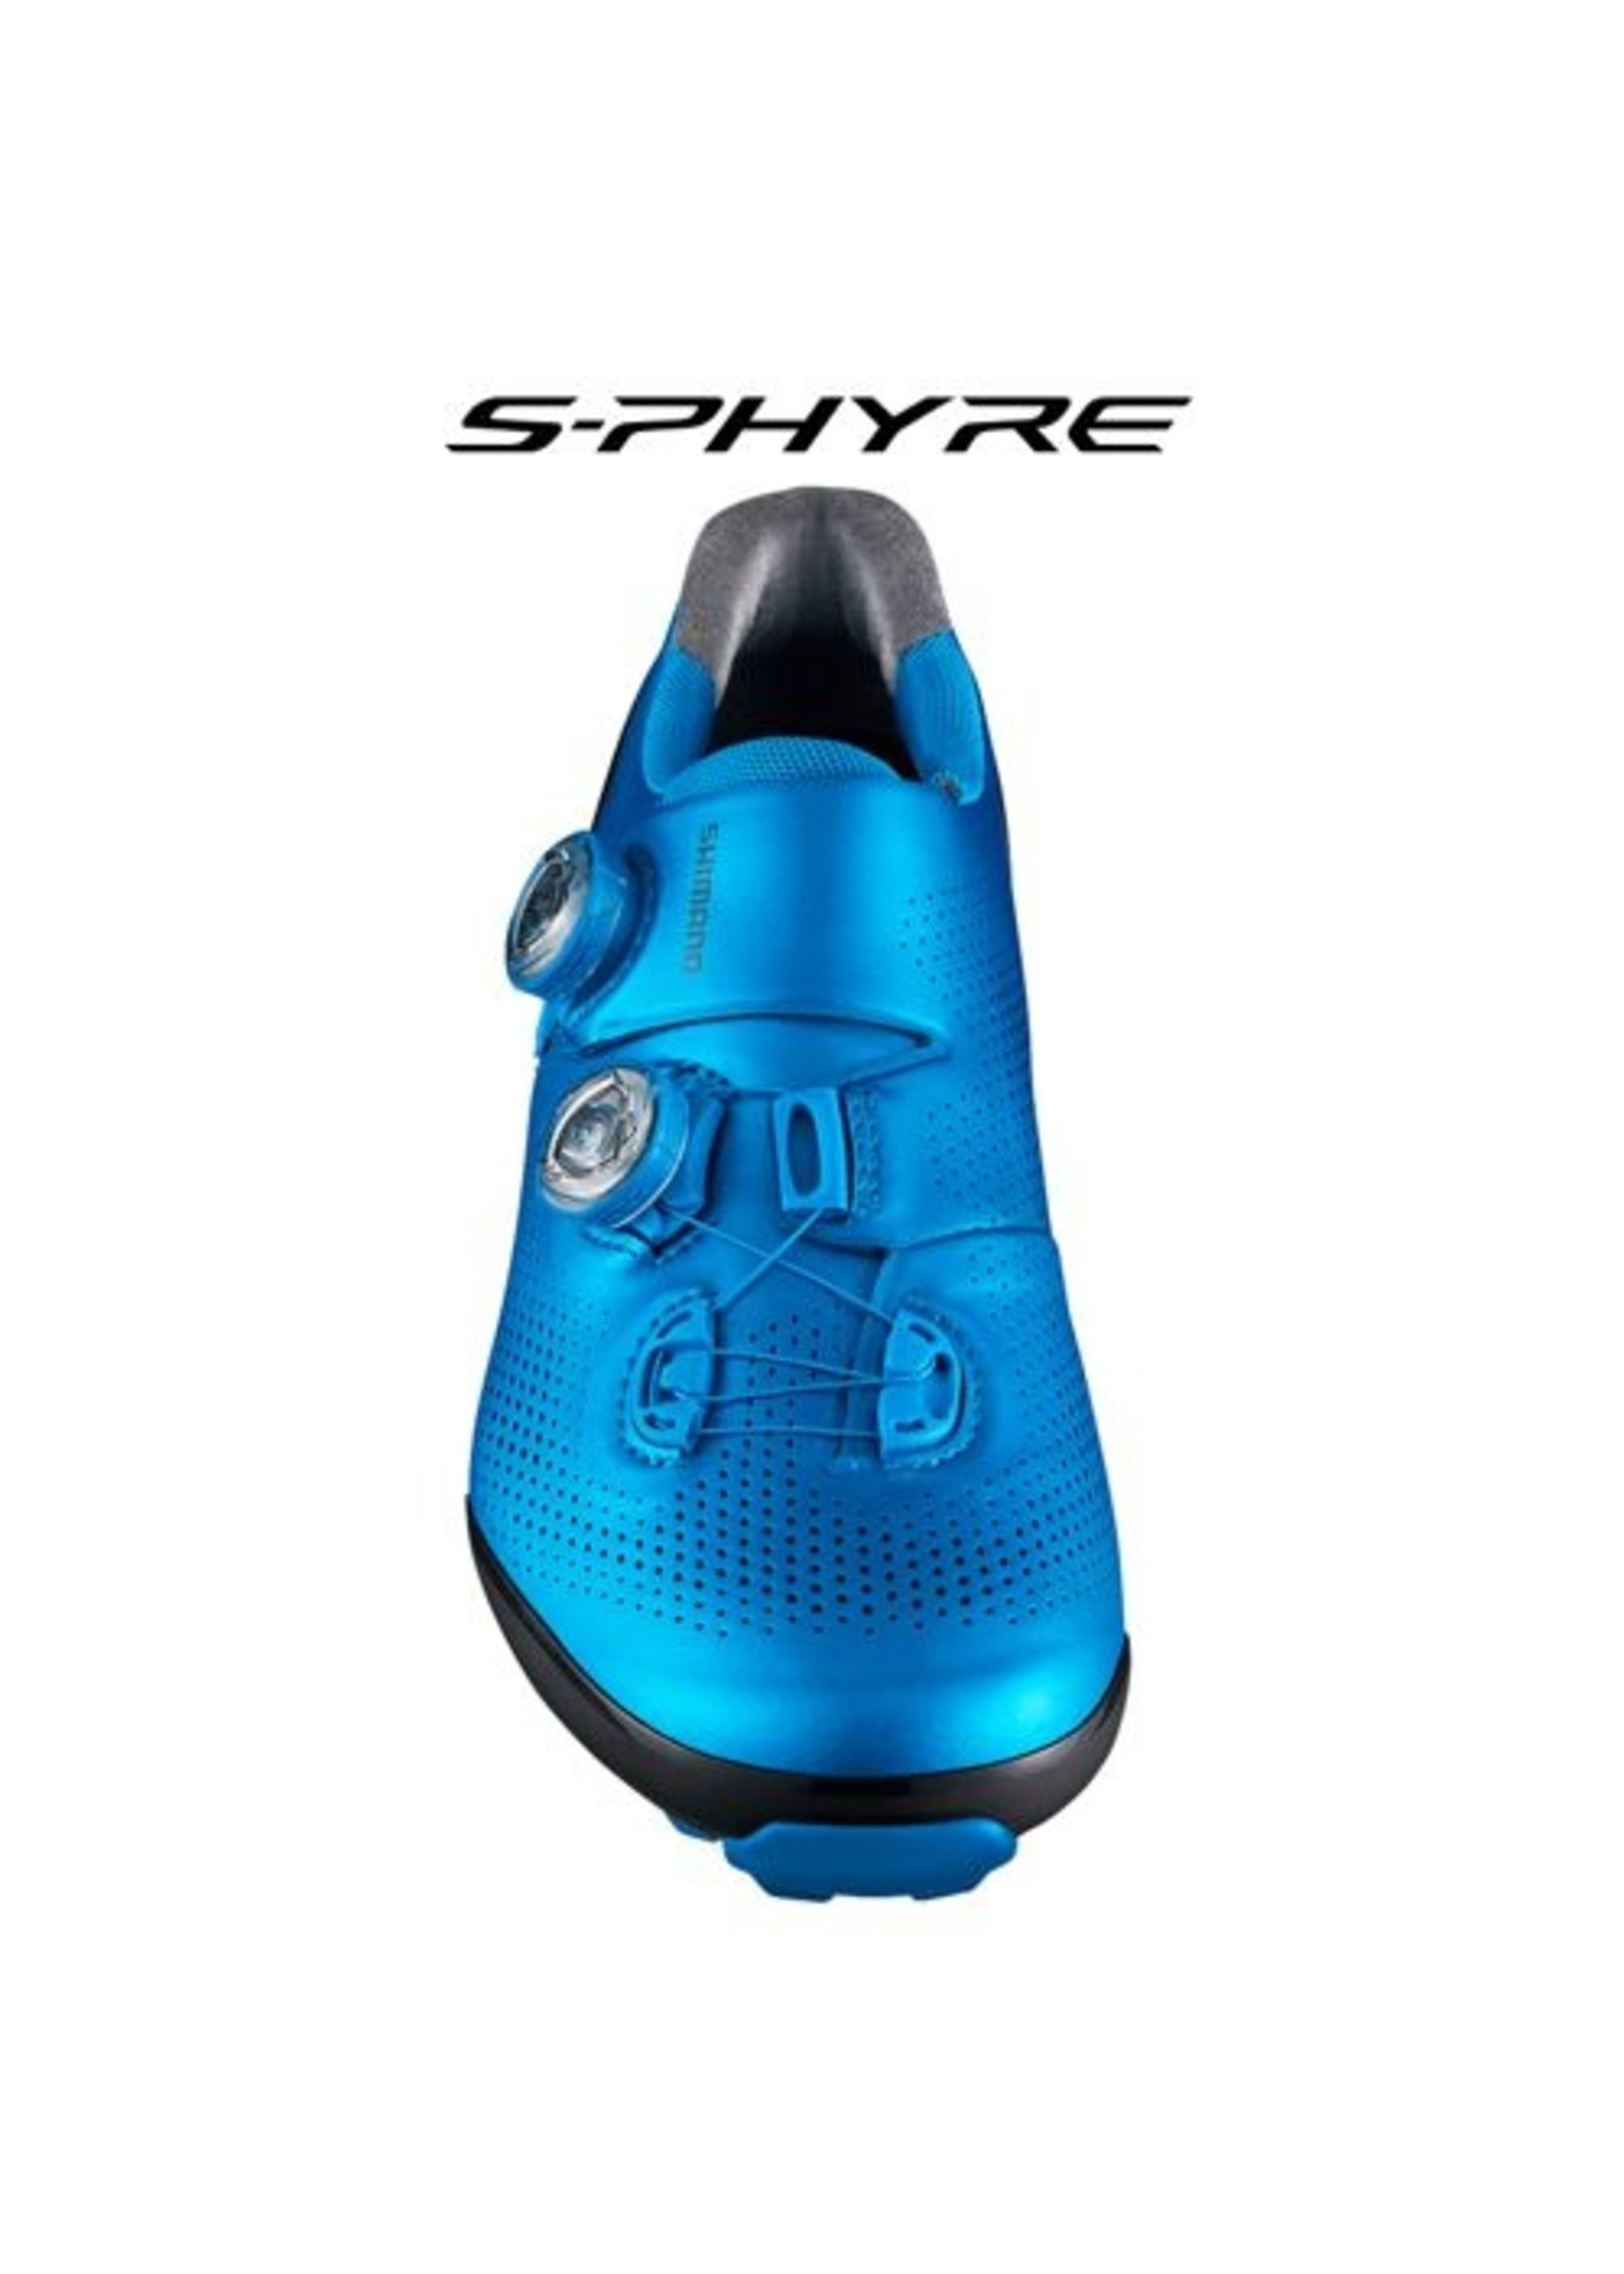 Shimano Shimano S-Phyre Bicycle Shoes Blue